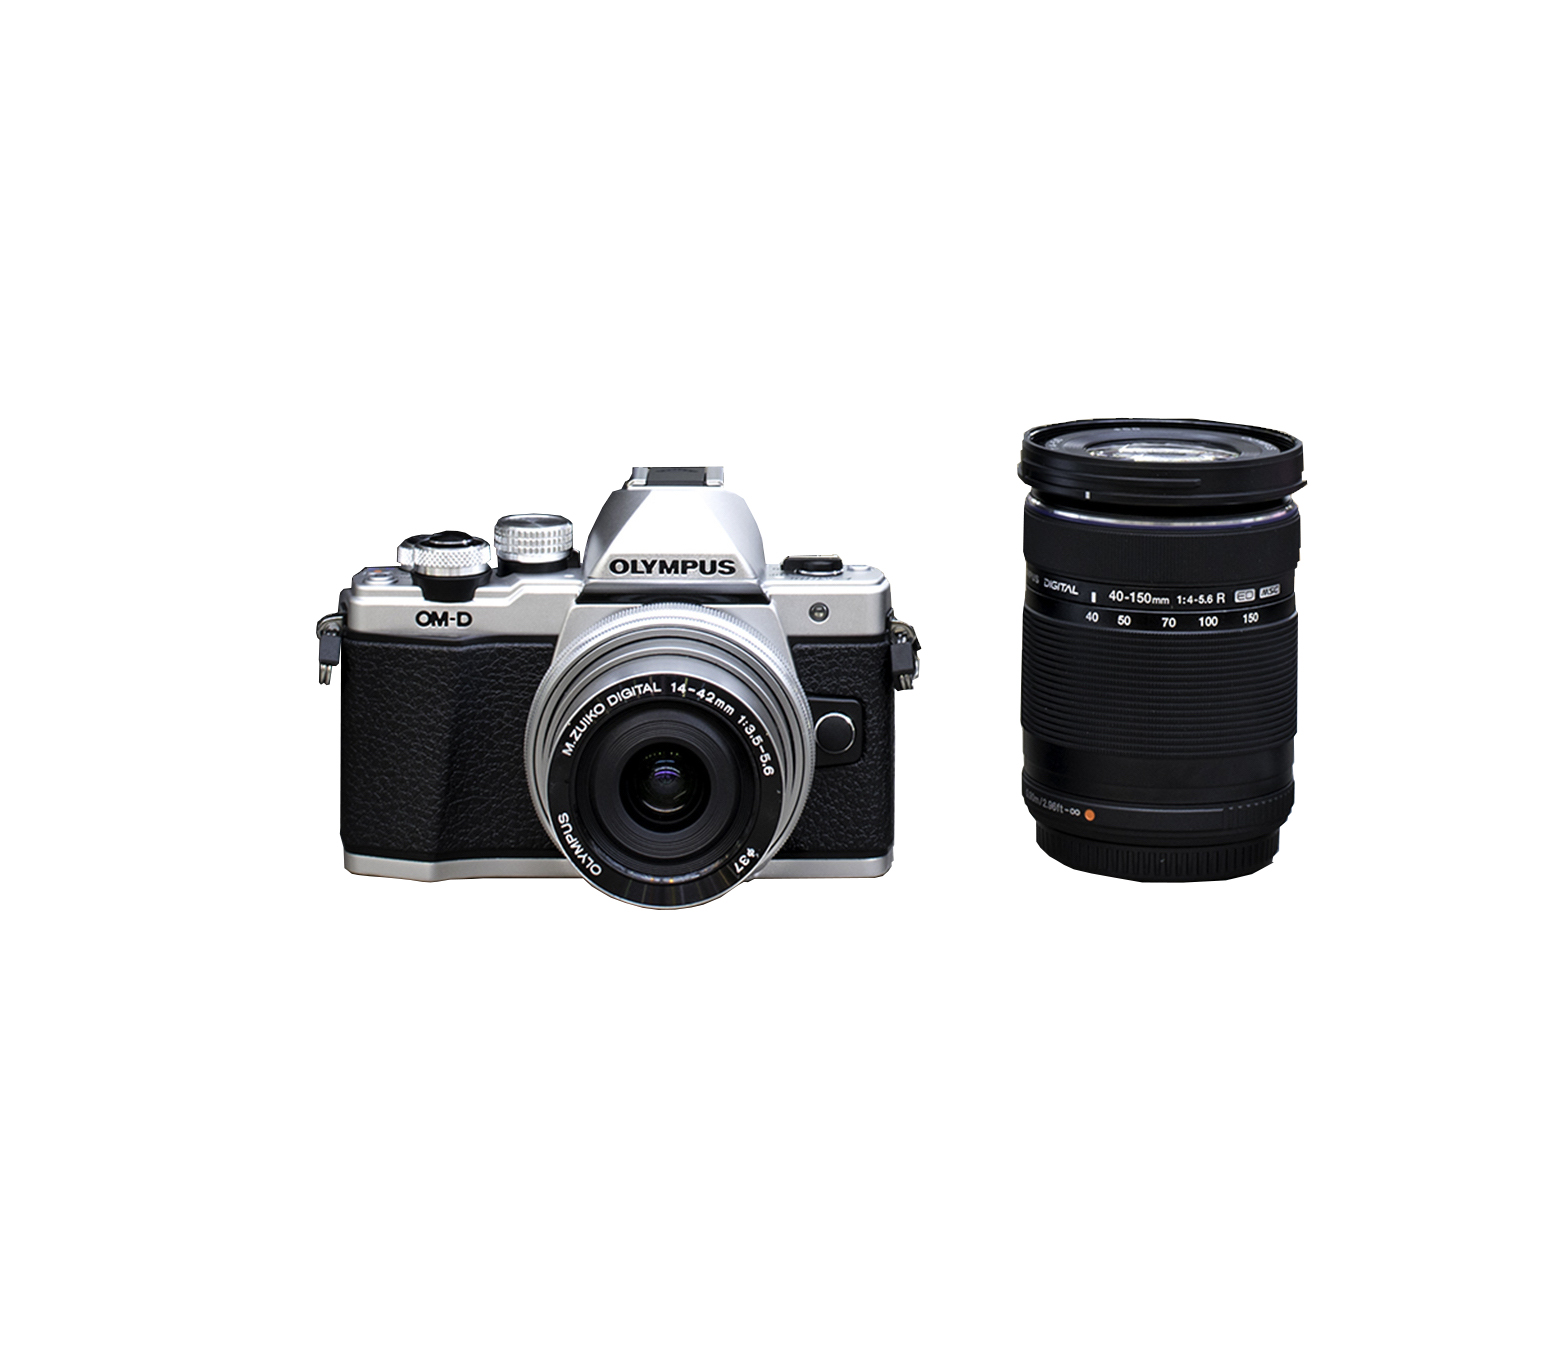 79 Olympus Camera Logo World Photo Trip By Tough Om D E M10 Mark Iii Kit 14 42mm F 35 56 Ez Silver Ii Lens 42 Mm 40 150